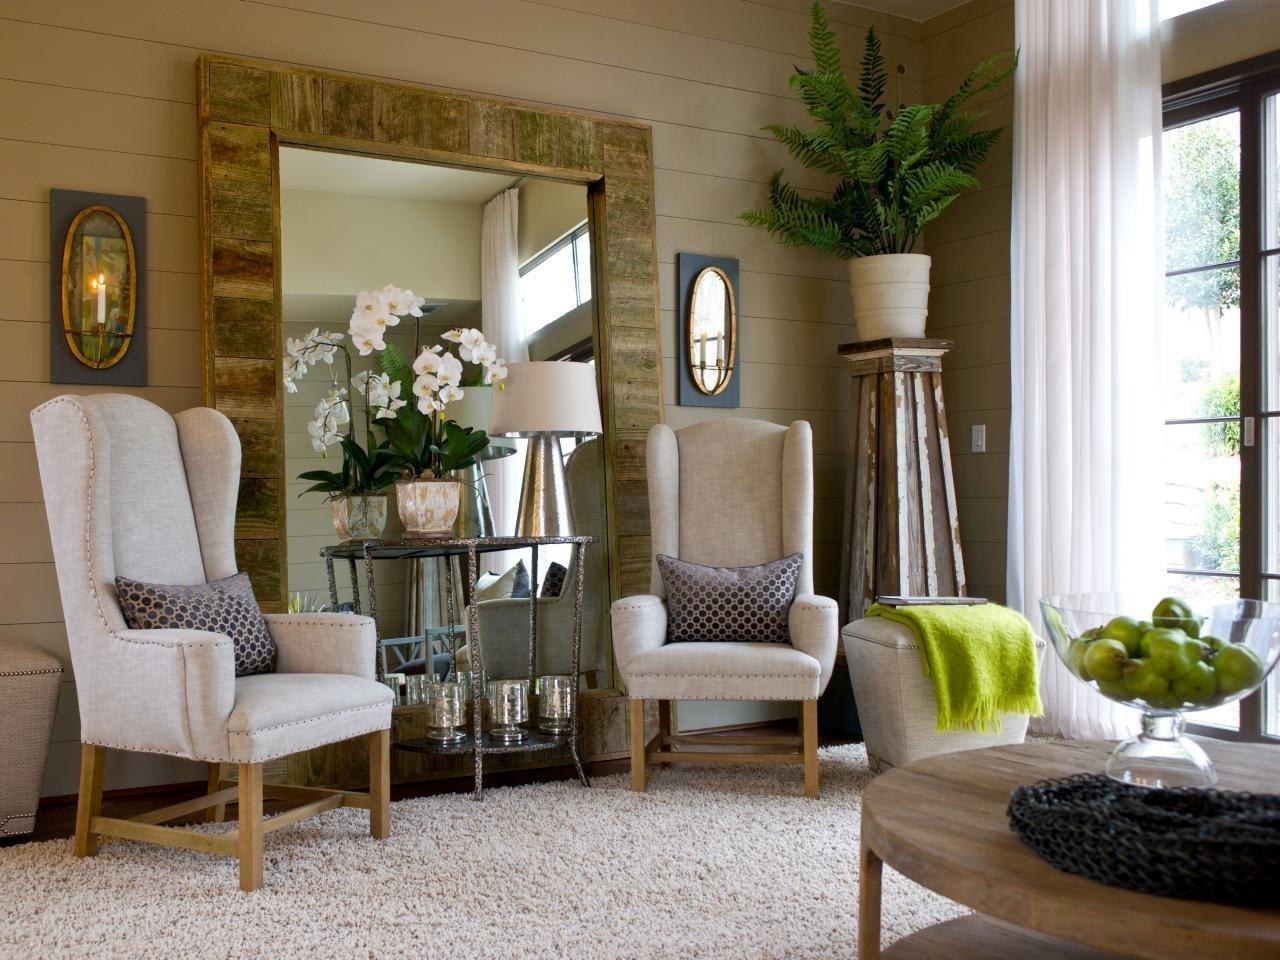 Delightful Large Floor Mirror For Elegant Living Room Designs